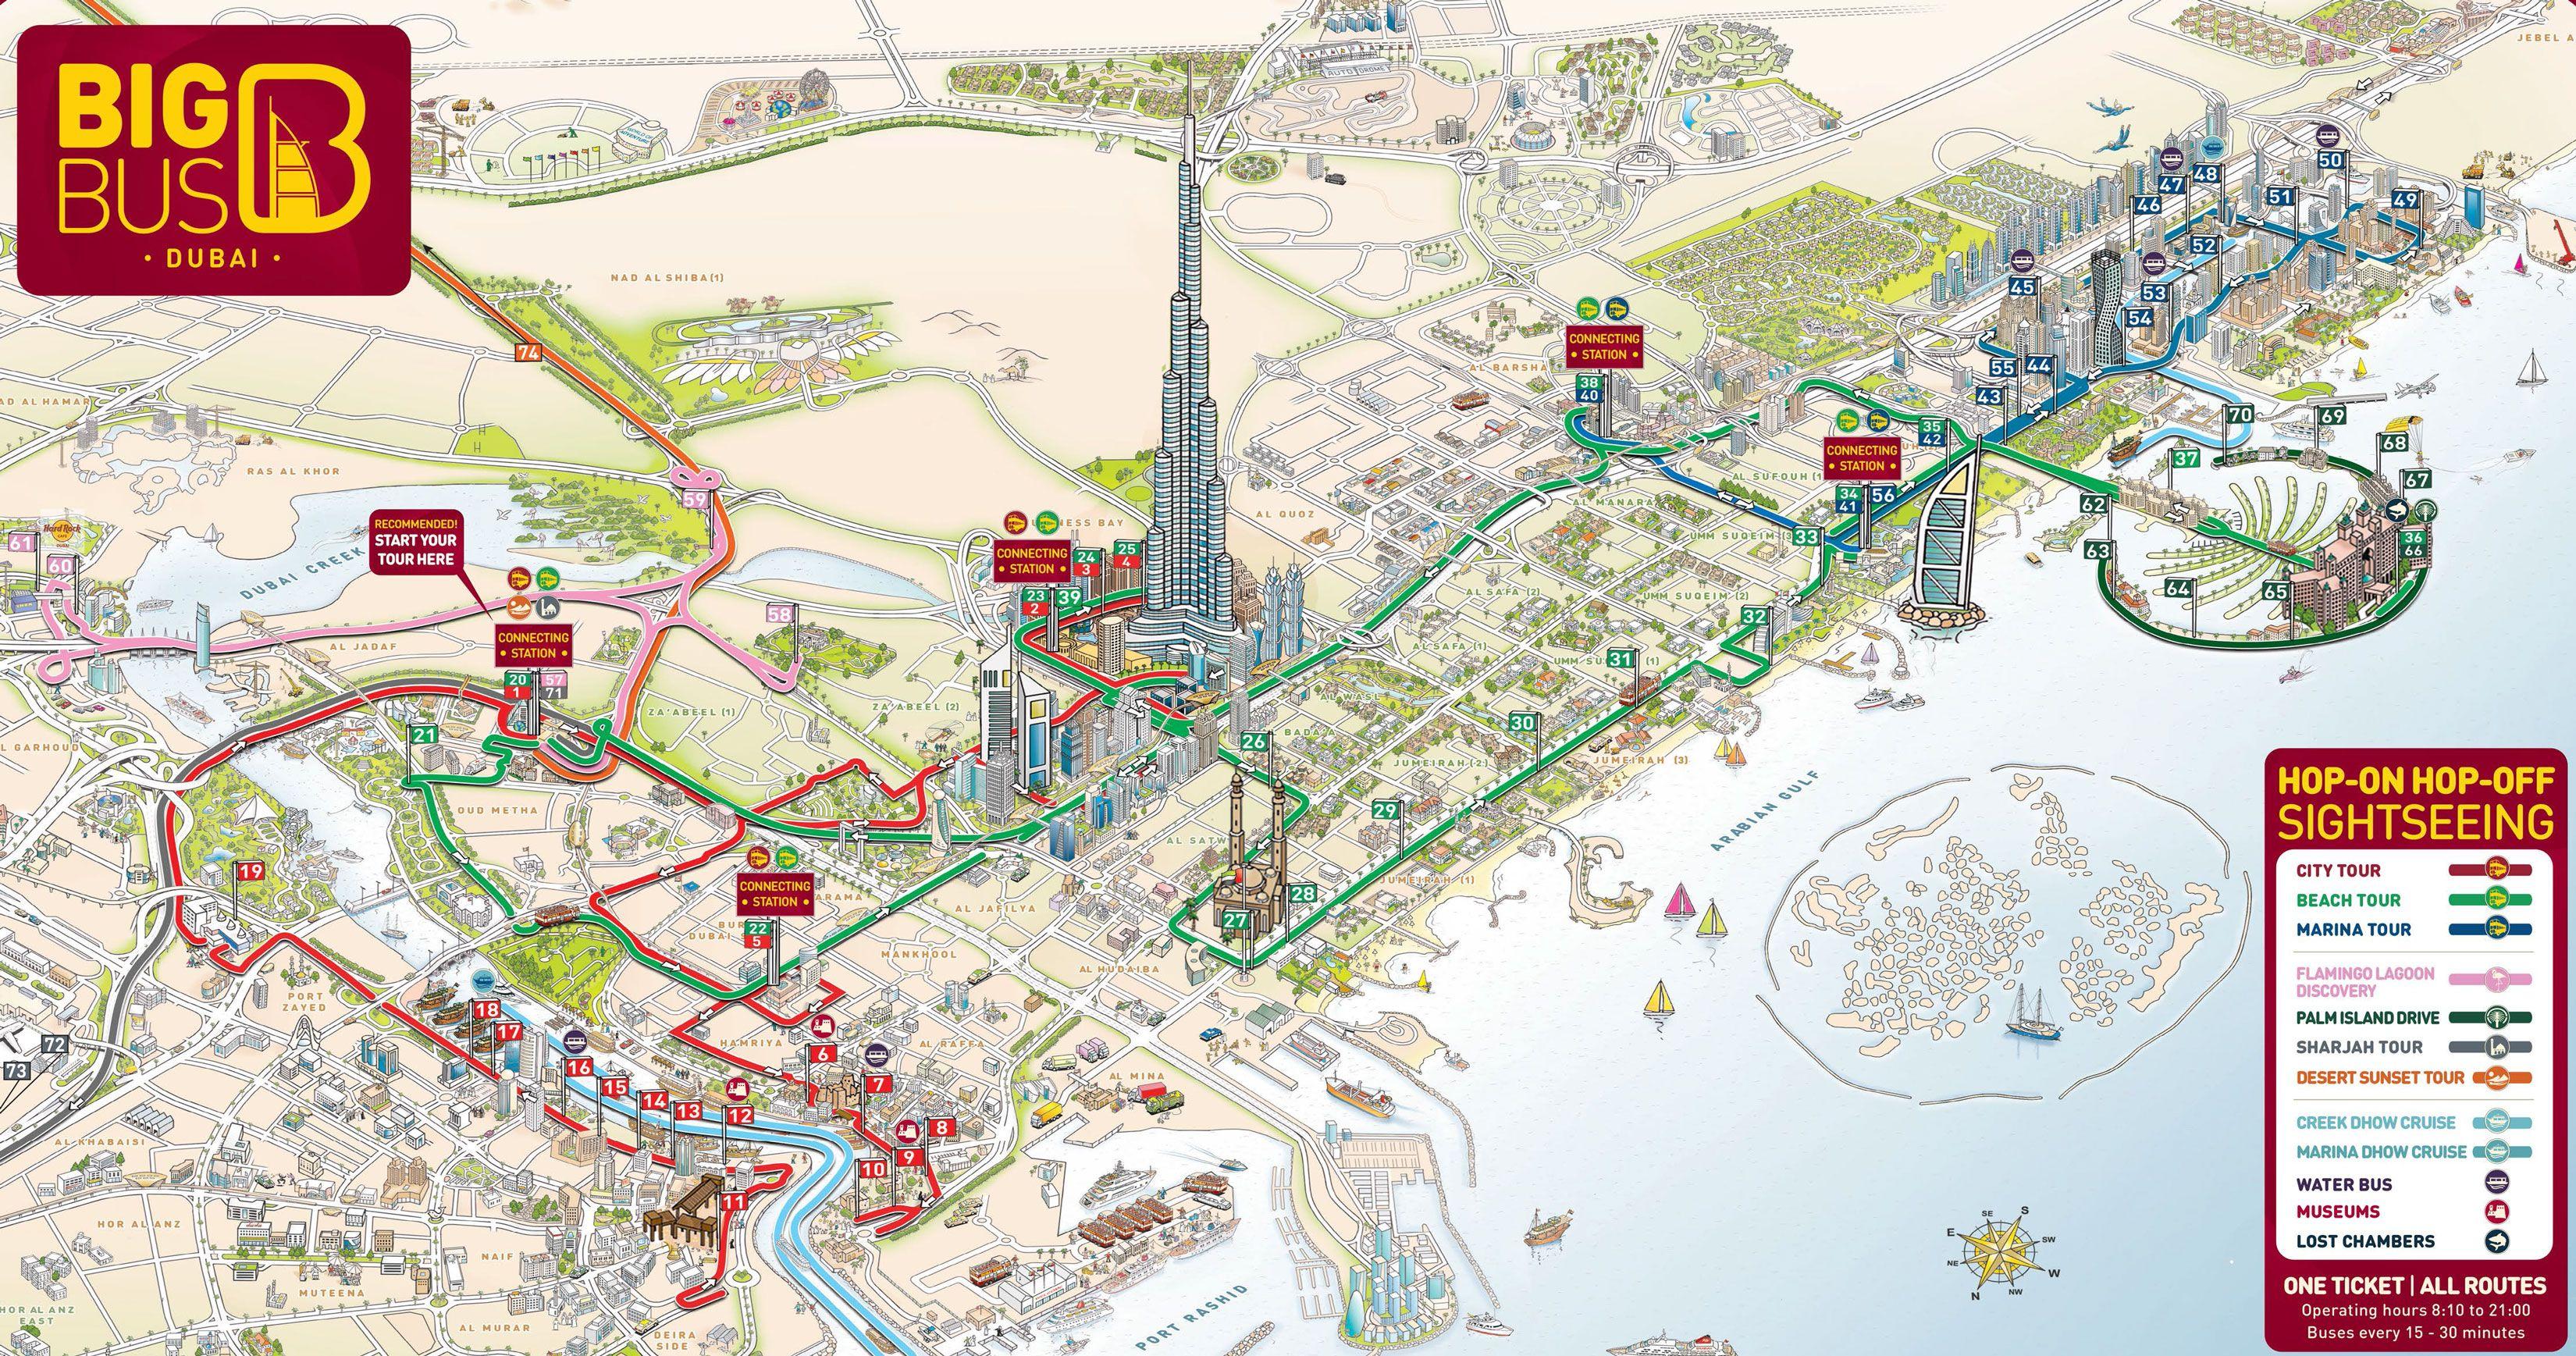 dubaimap360com carte image en dubaibustourjpg Dubai